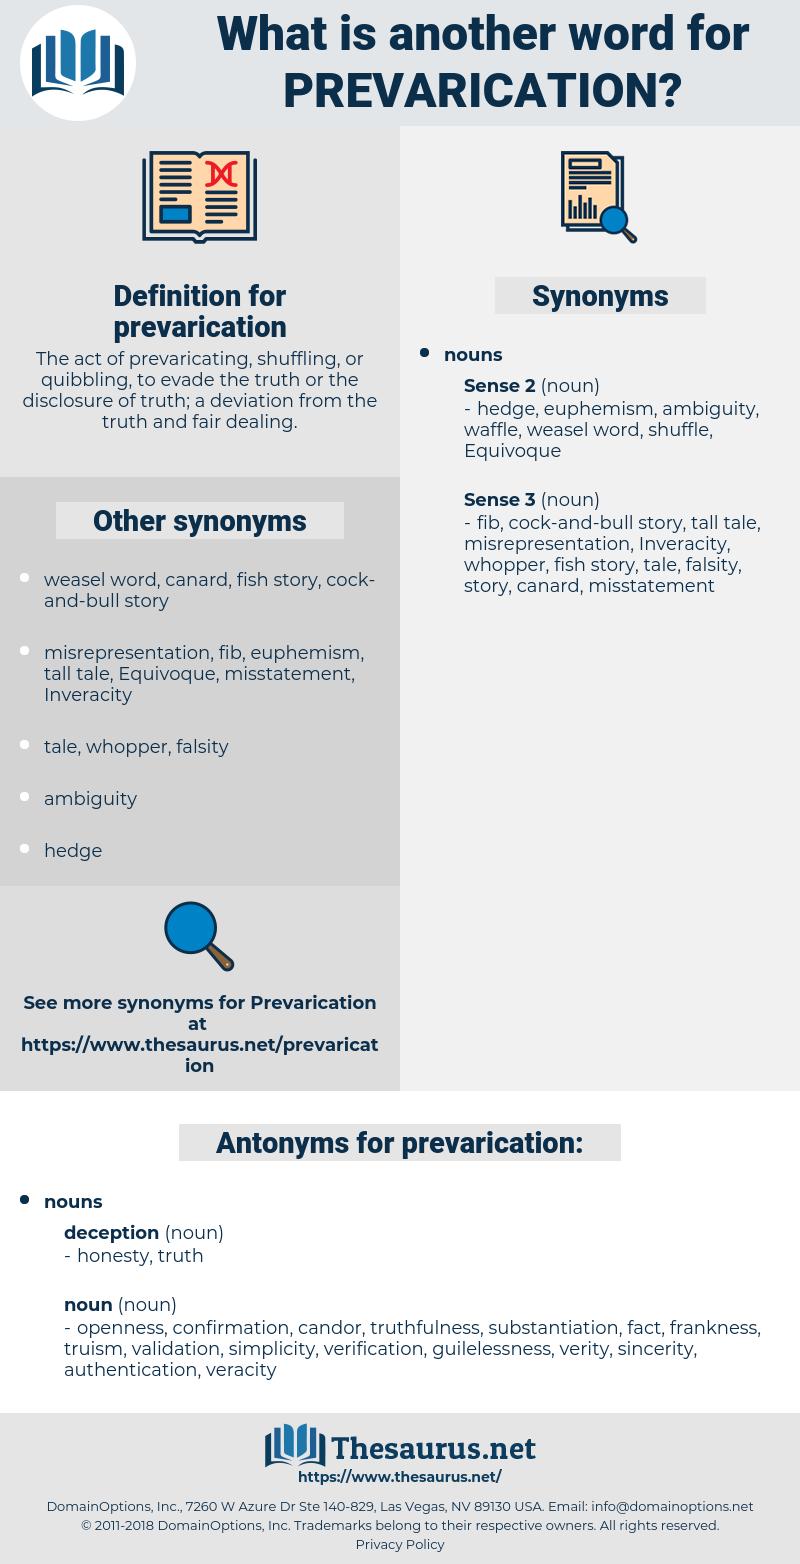 prevarication, synonym prevarication, another word for prevarication, words like prevarication, thesaurus prevarication